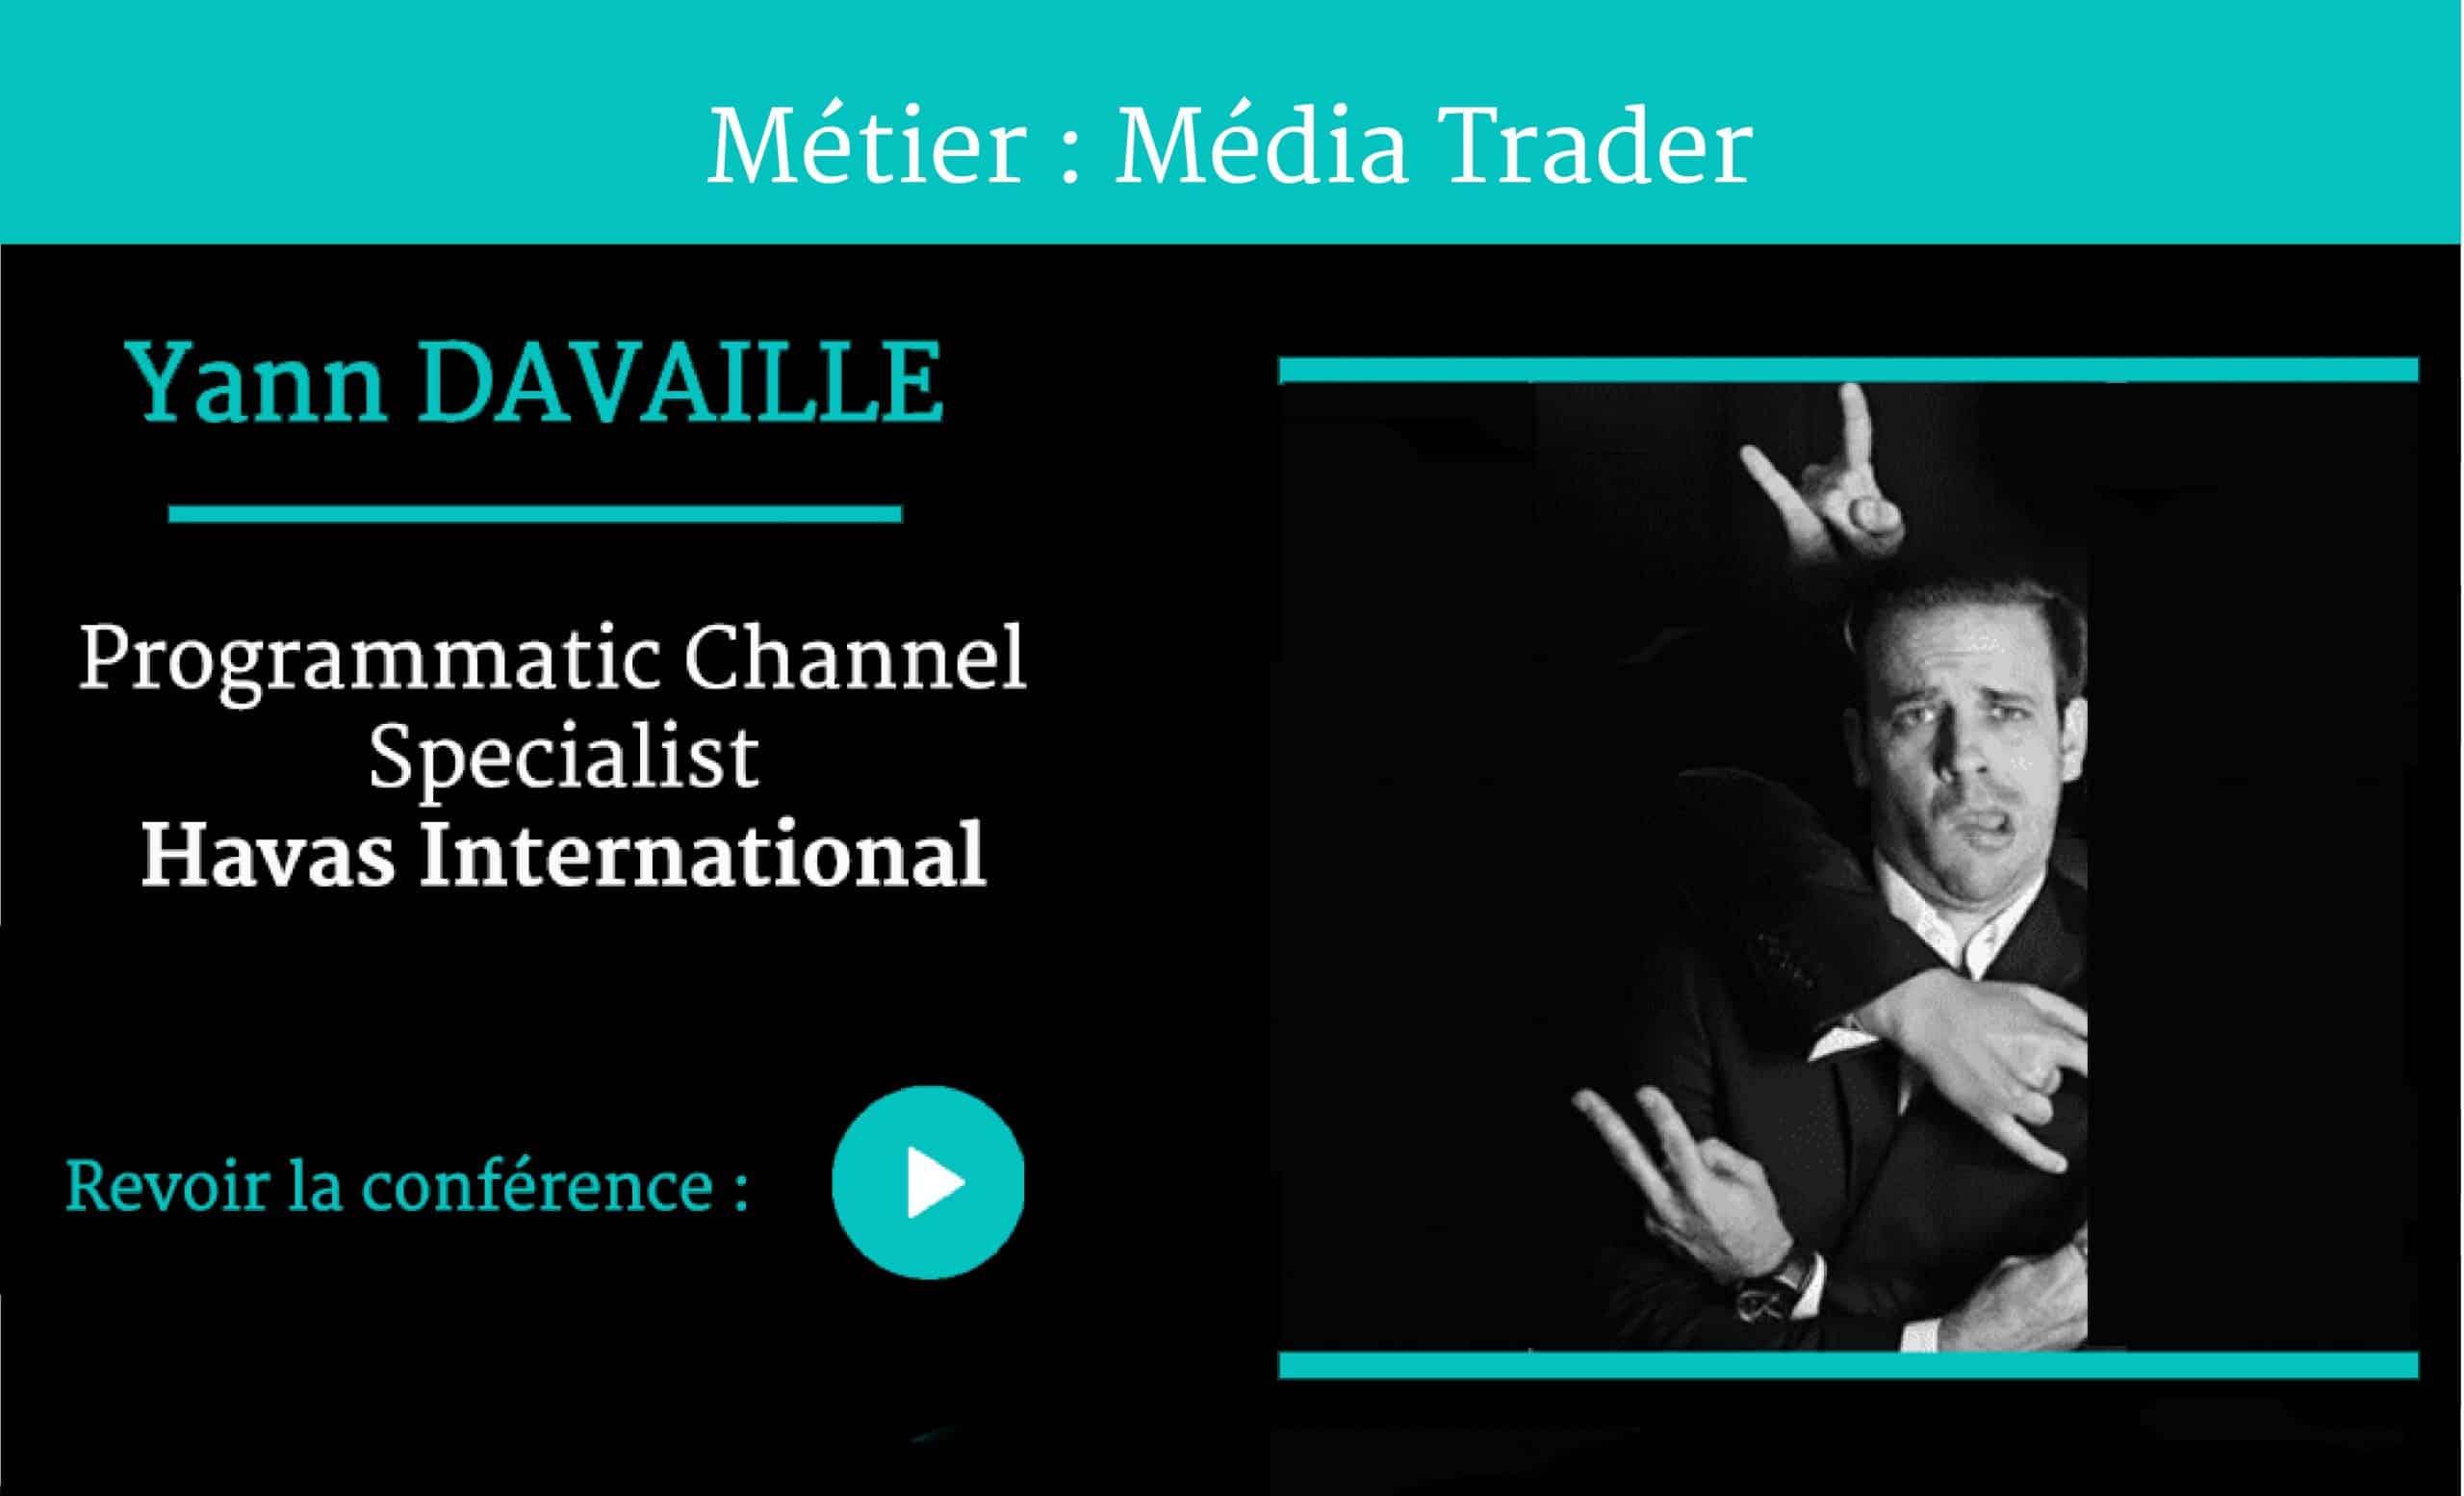 Métier Media Trader ,conférence par Yann DAVAILLE ,pour Naïas – National Institute of Advertising Strategy